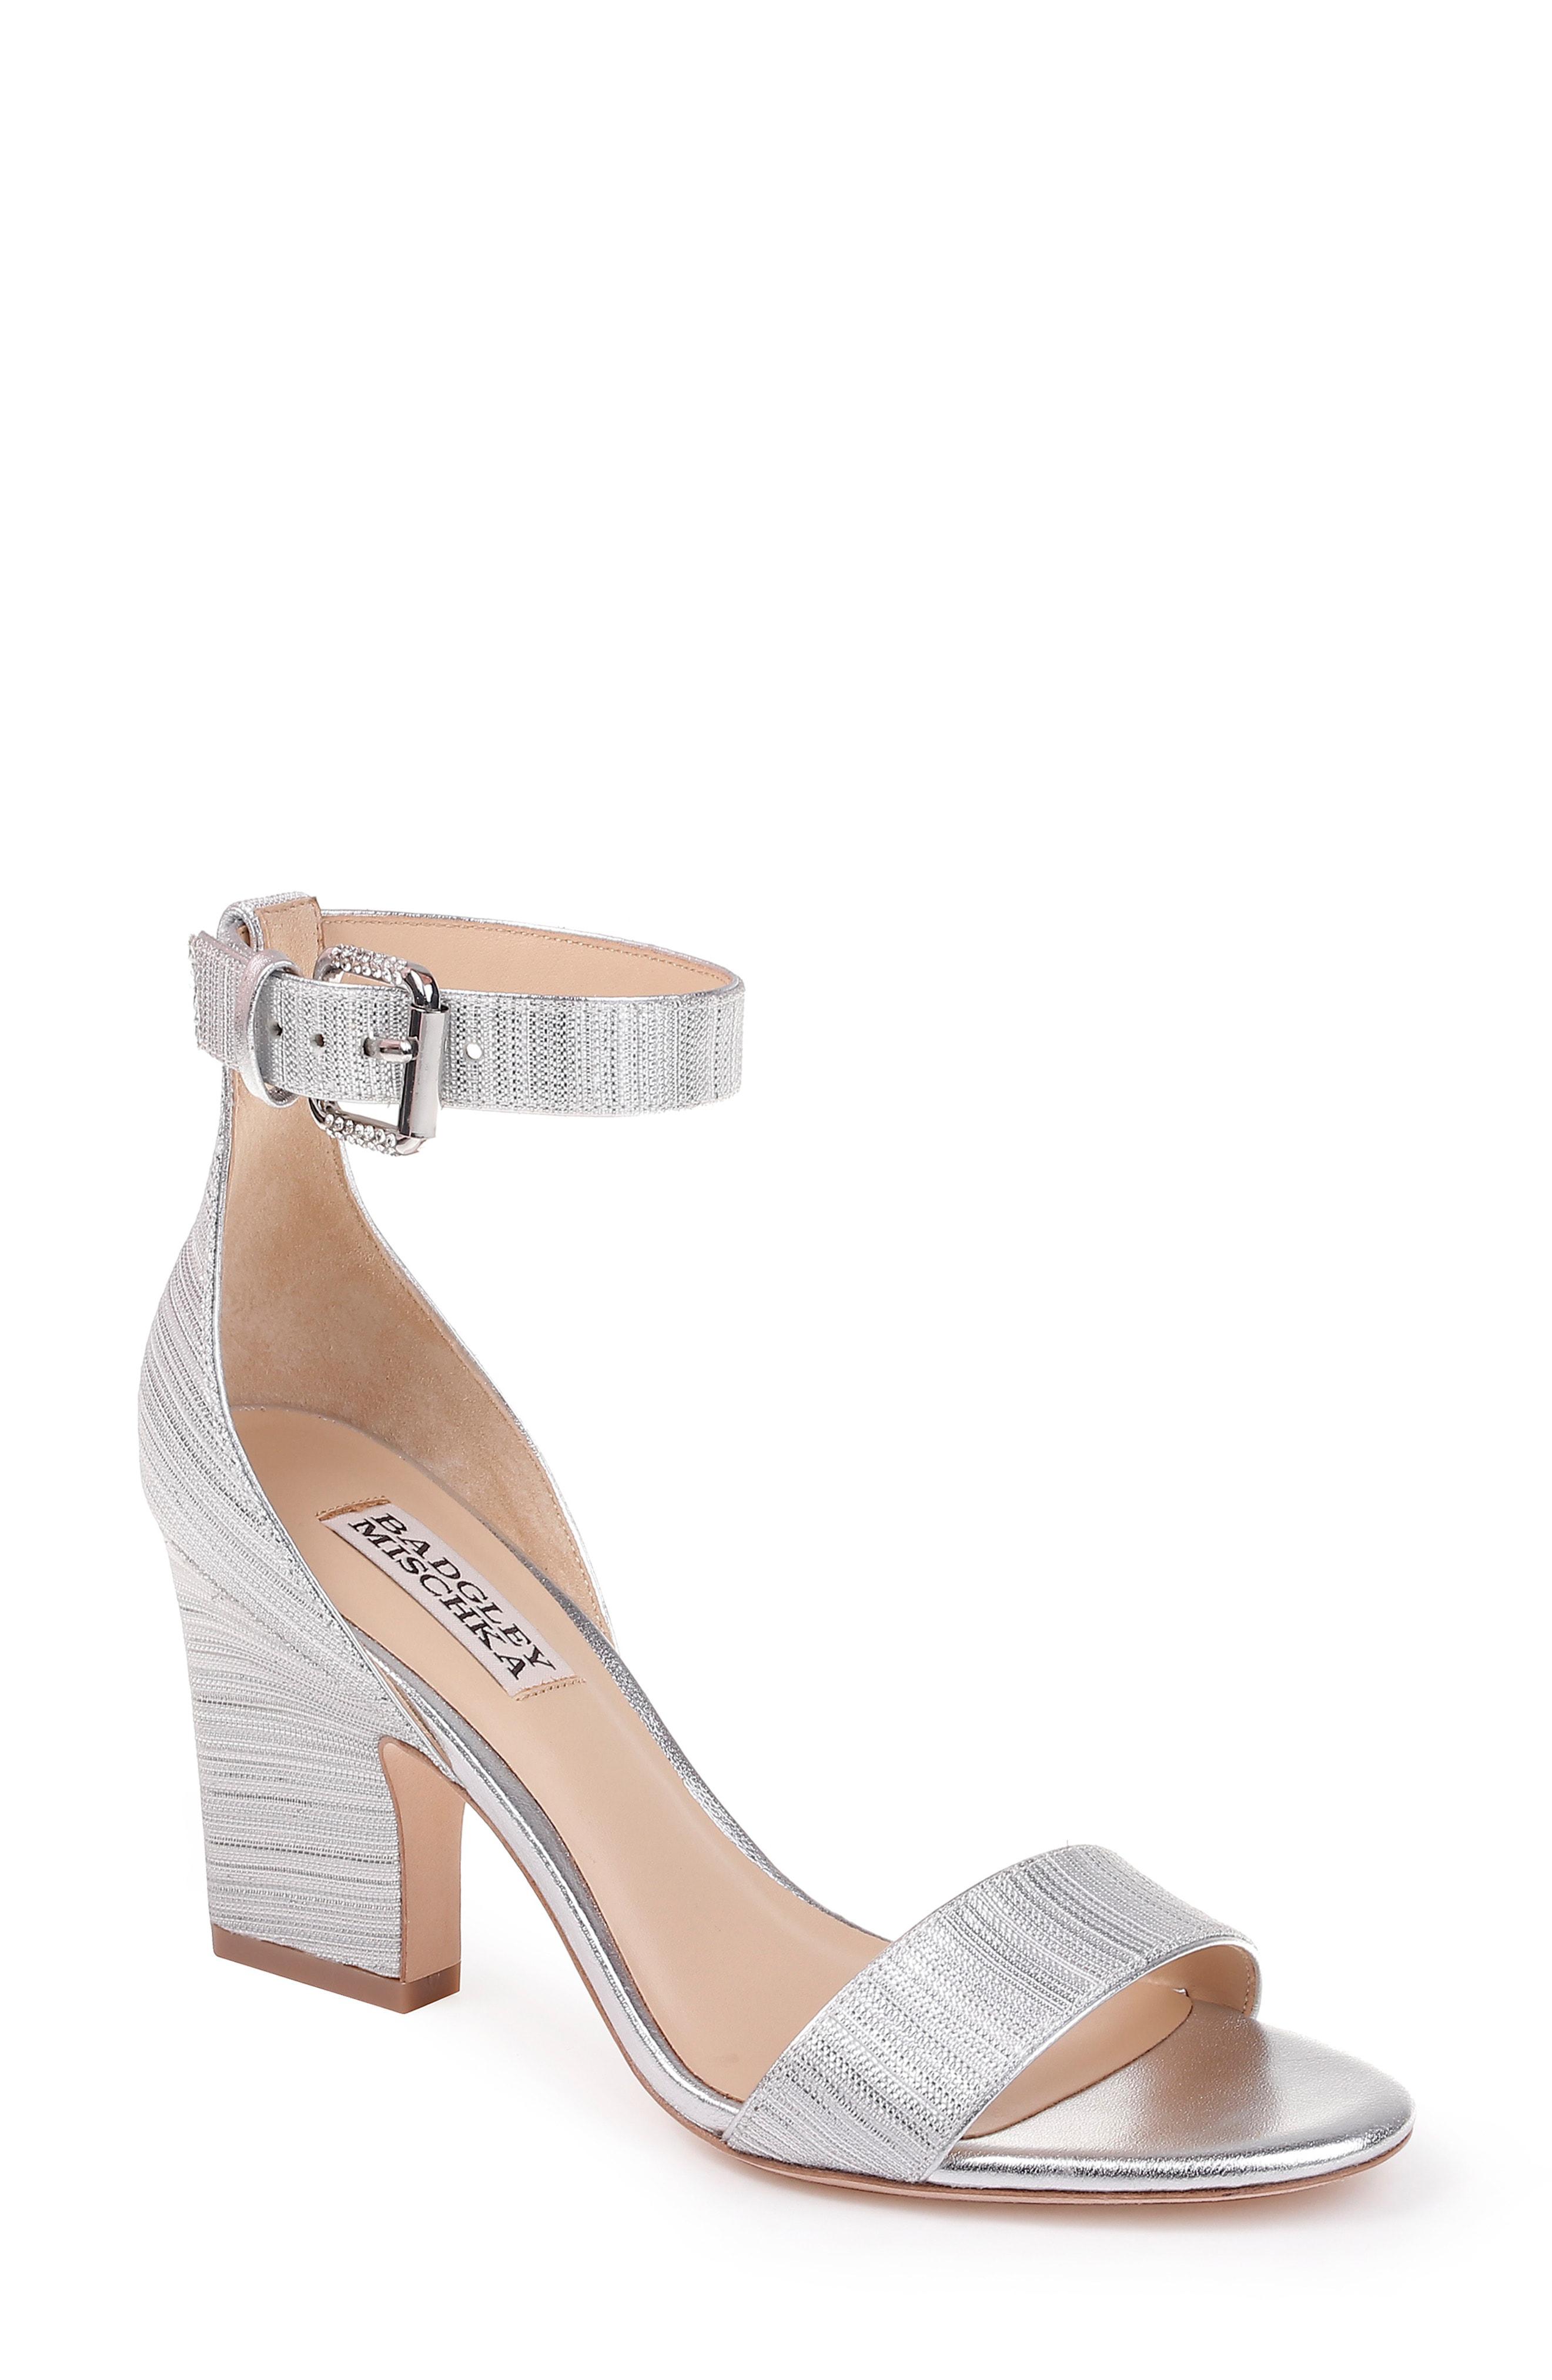 474061b572b Badgley Mischka Loreen Block Heel Sandal In Silver Glitter Fabric ...